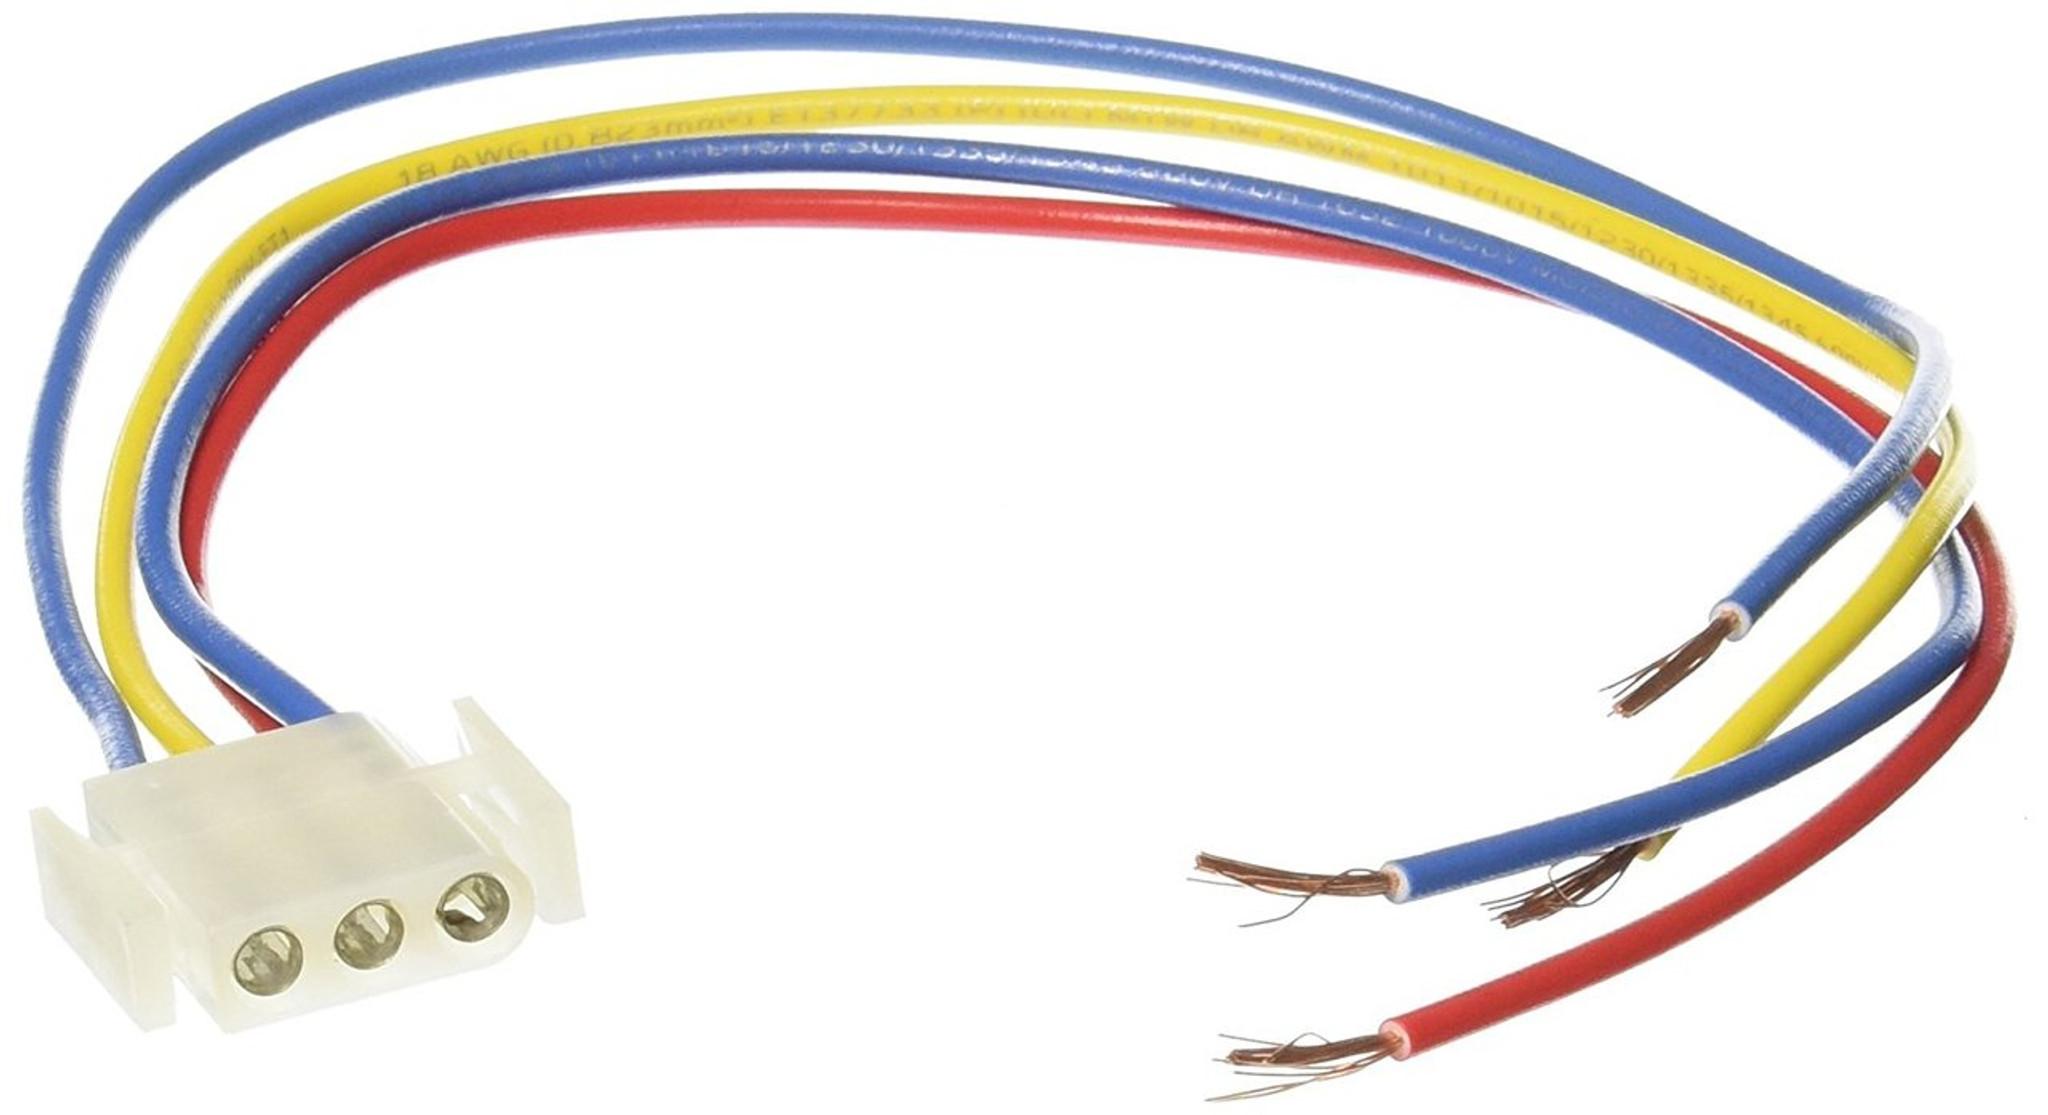 medium resolution of suburban furnace power supply wire harness 520322 3 pin female suburban rv furnace wiring harness